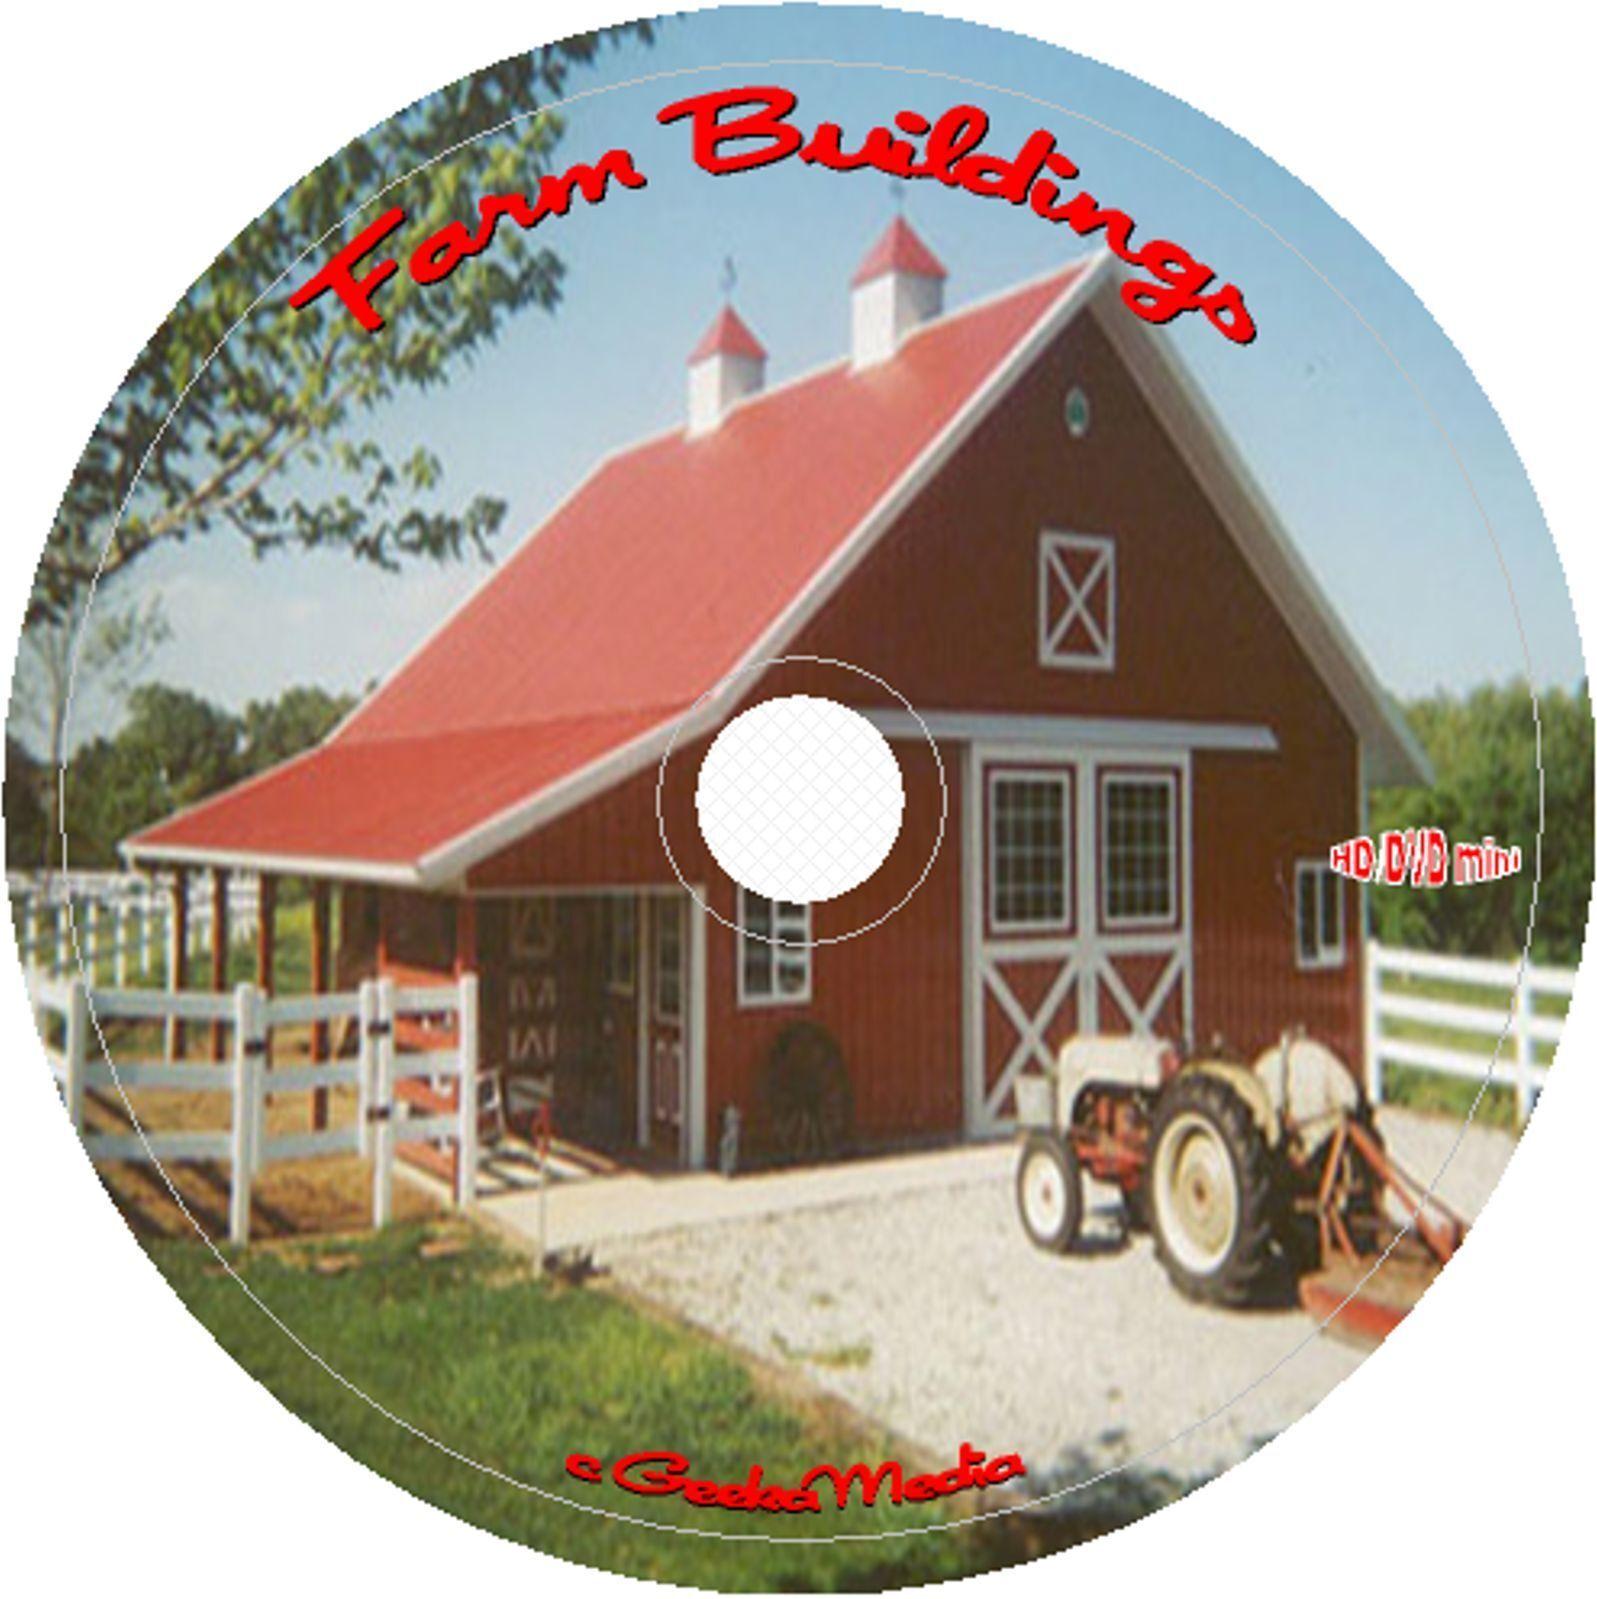 Best Barns Farm Sheds Buildings 95 Professional Architect Plans 42 Books 95 DVD